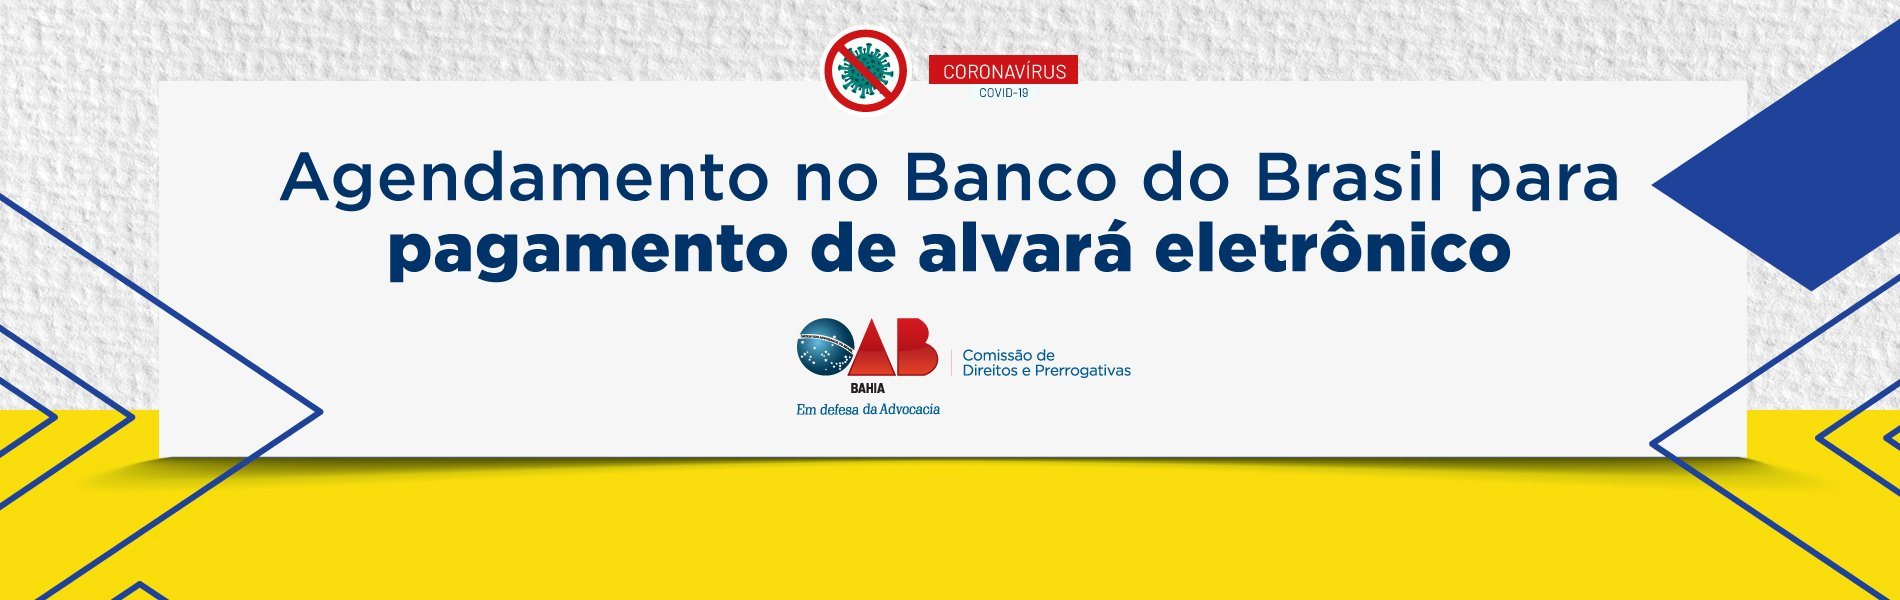 [Coronavírus: Agendamento no Banco do Brasil para pagamento de alvará eletrônico]